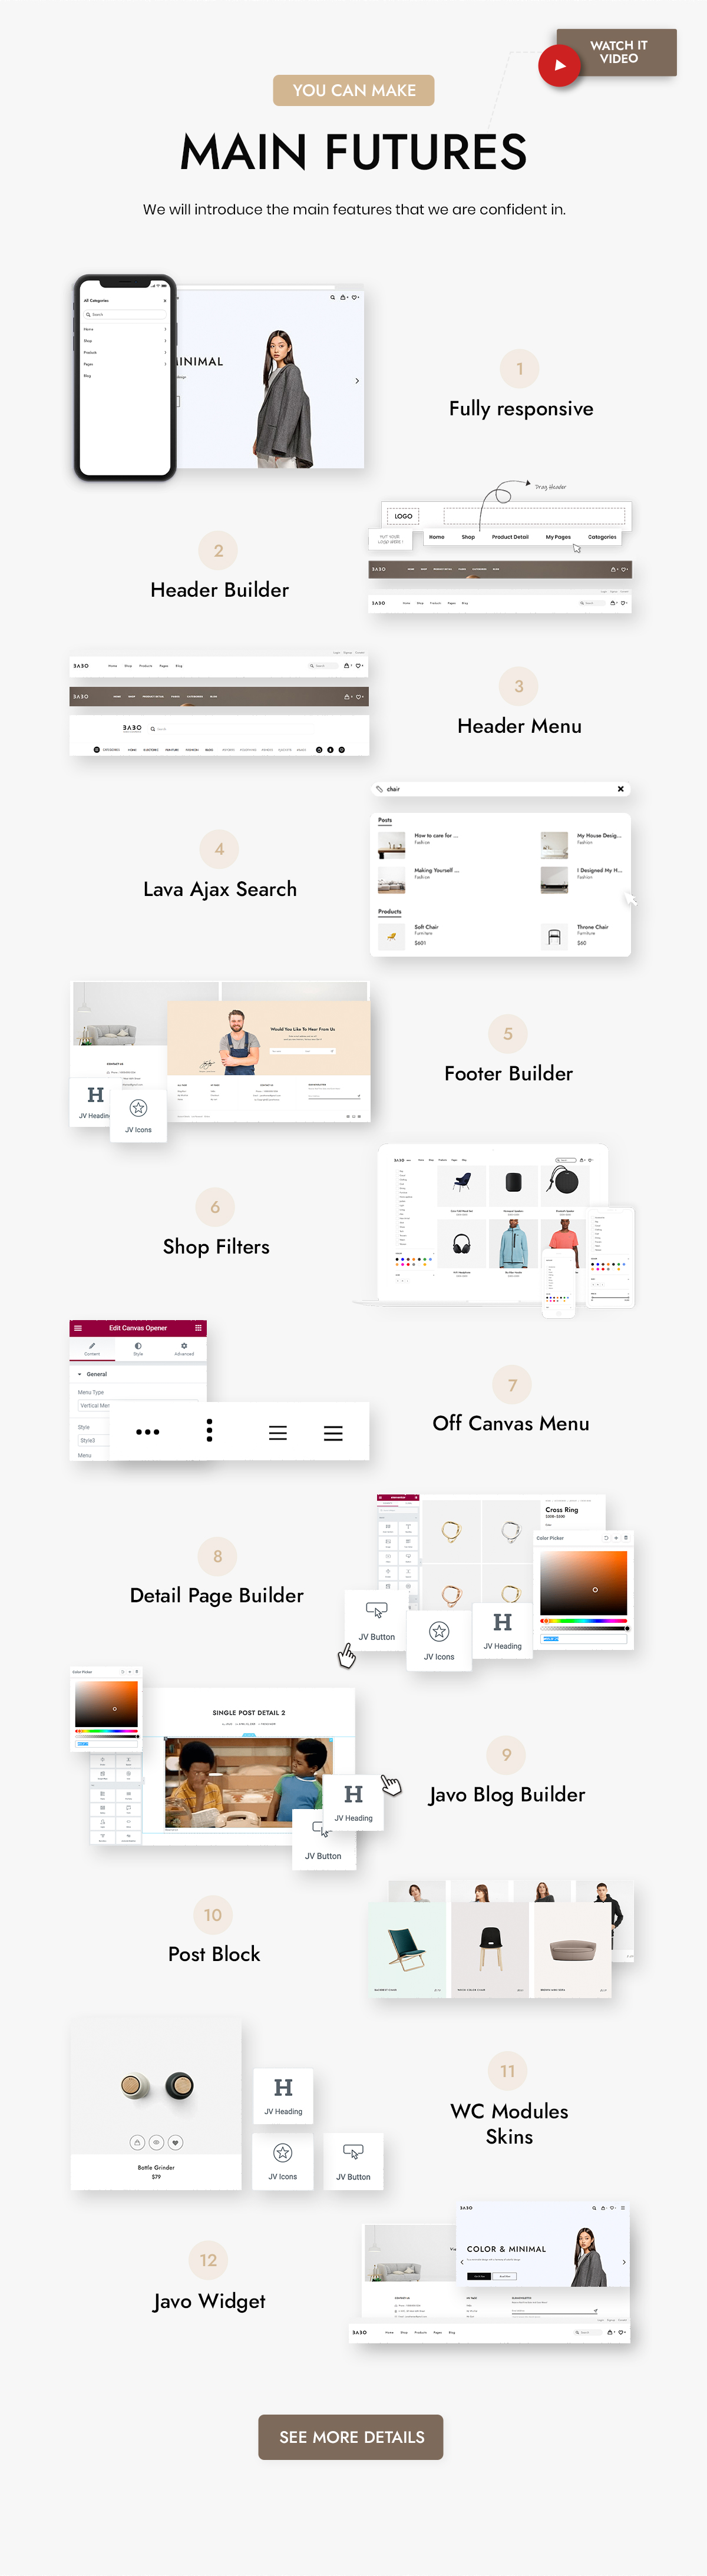 Babo - Modern & Flexible WooCommerce Theme - 16